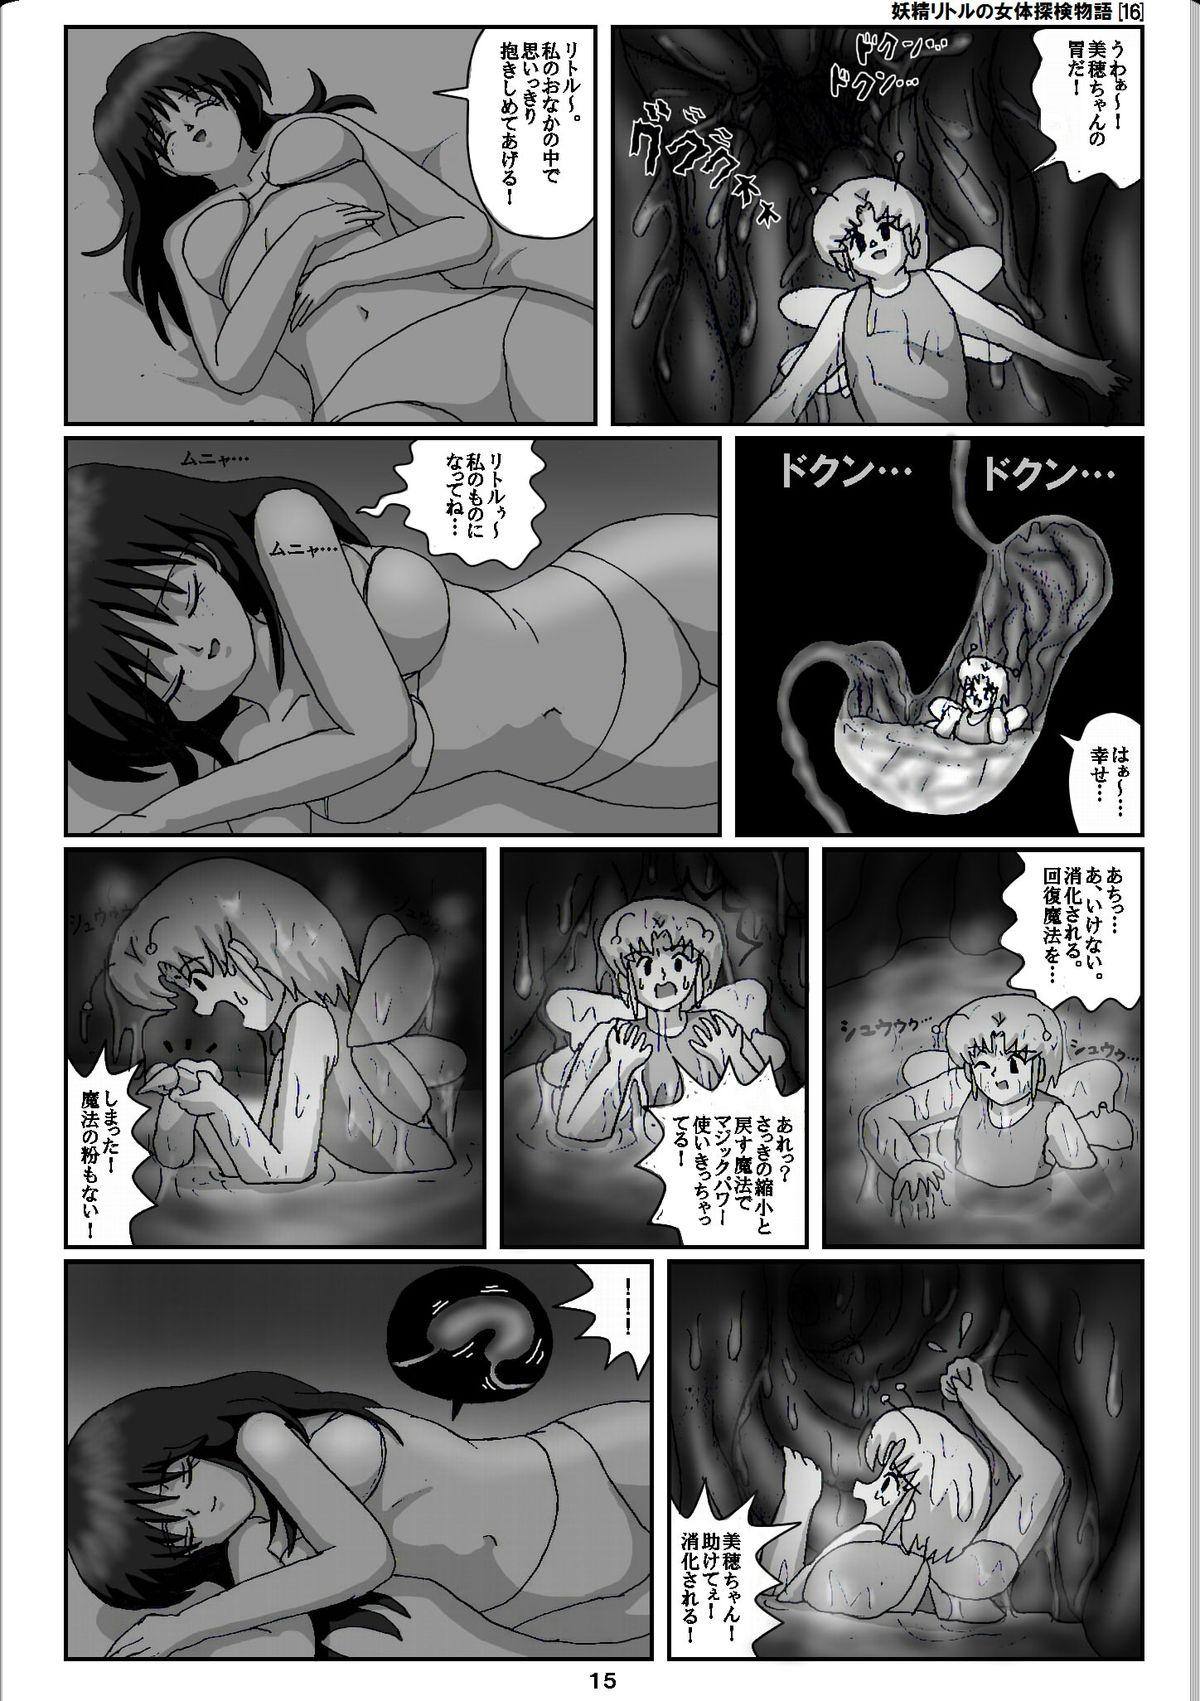 Yousei Little no Nyotai Tanken Monogatari 14